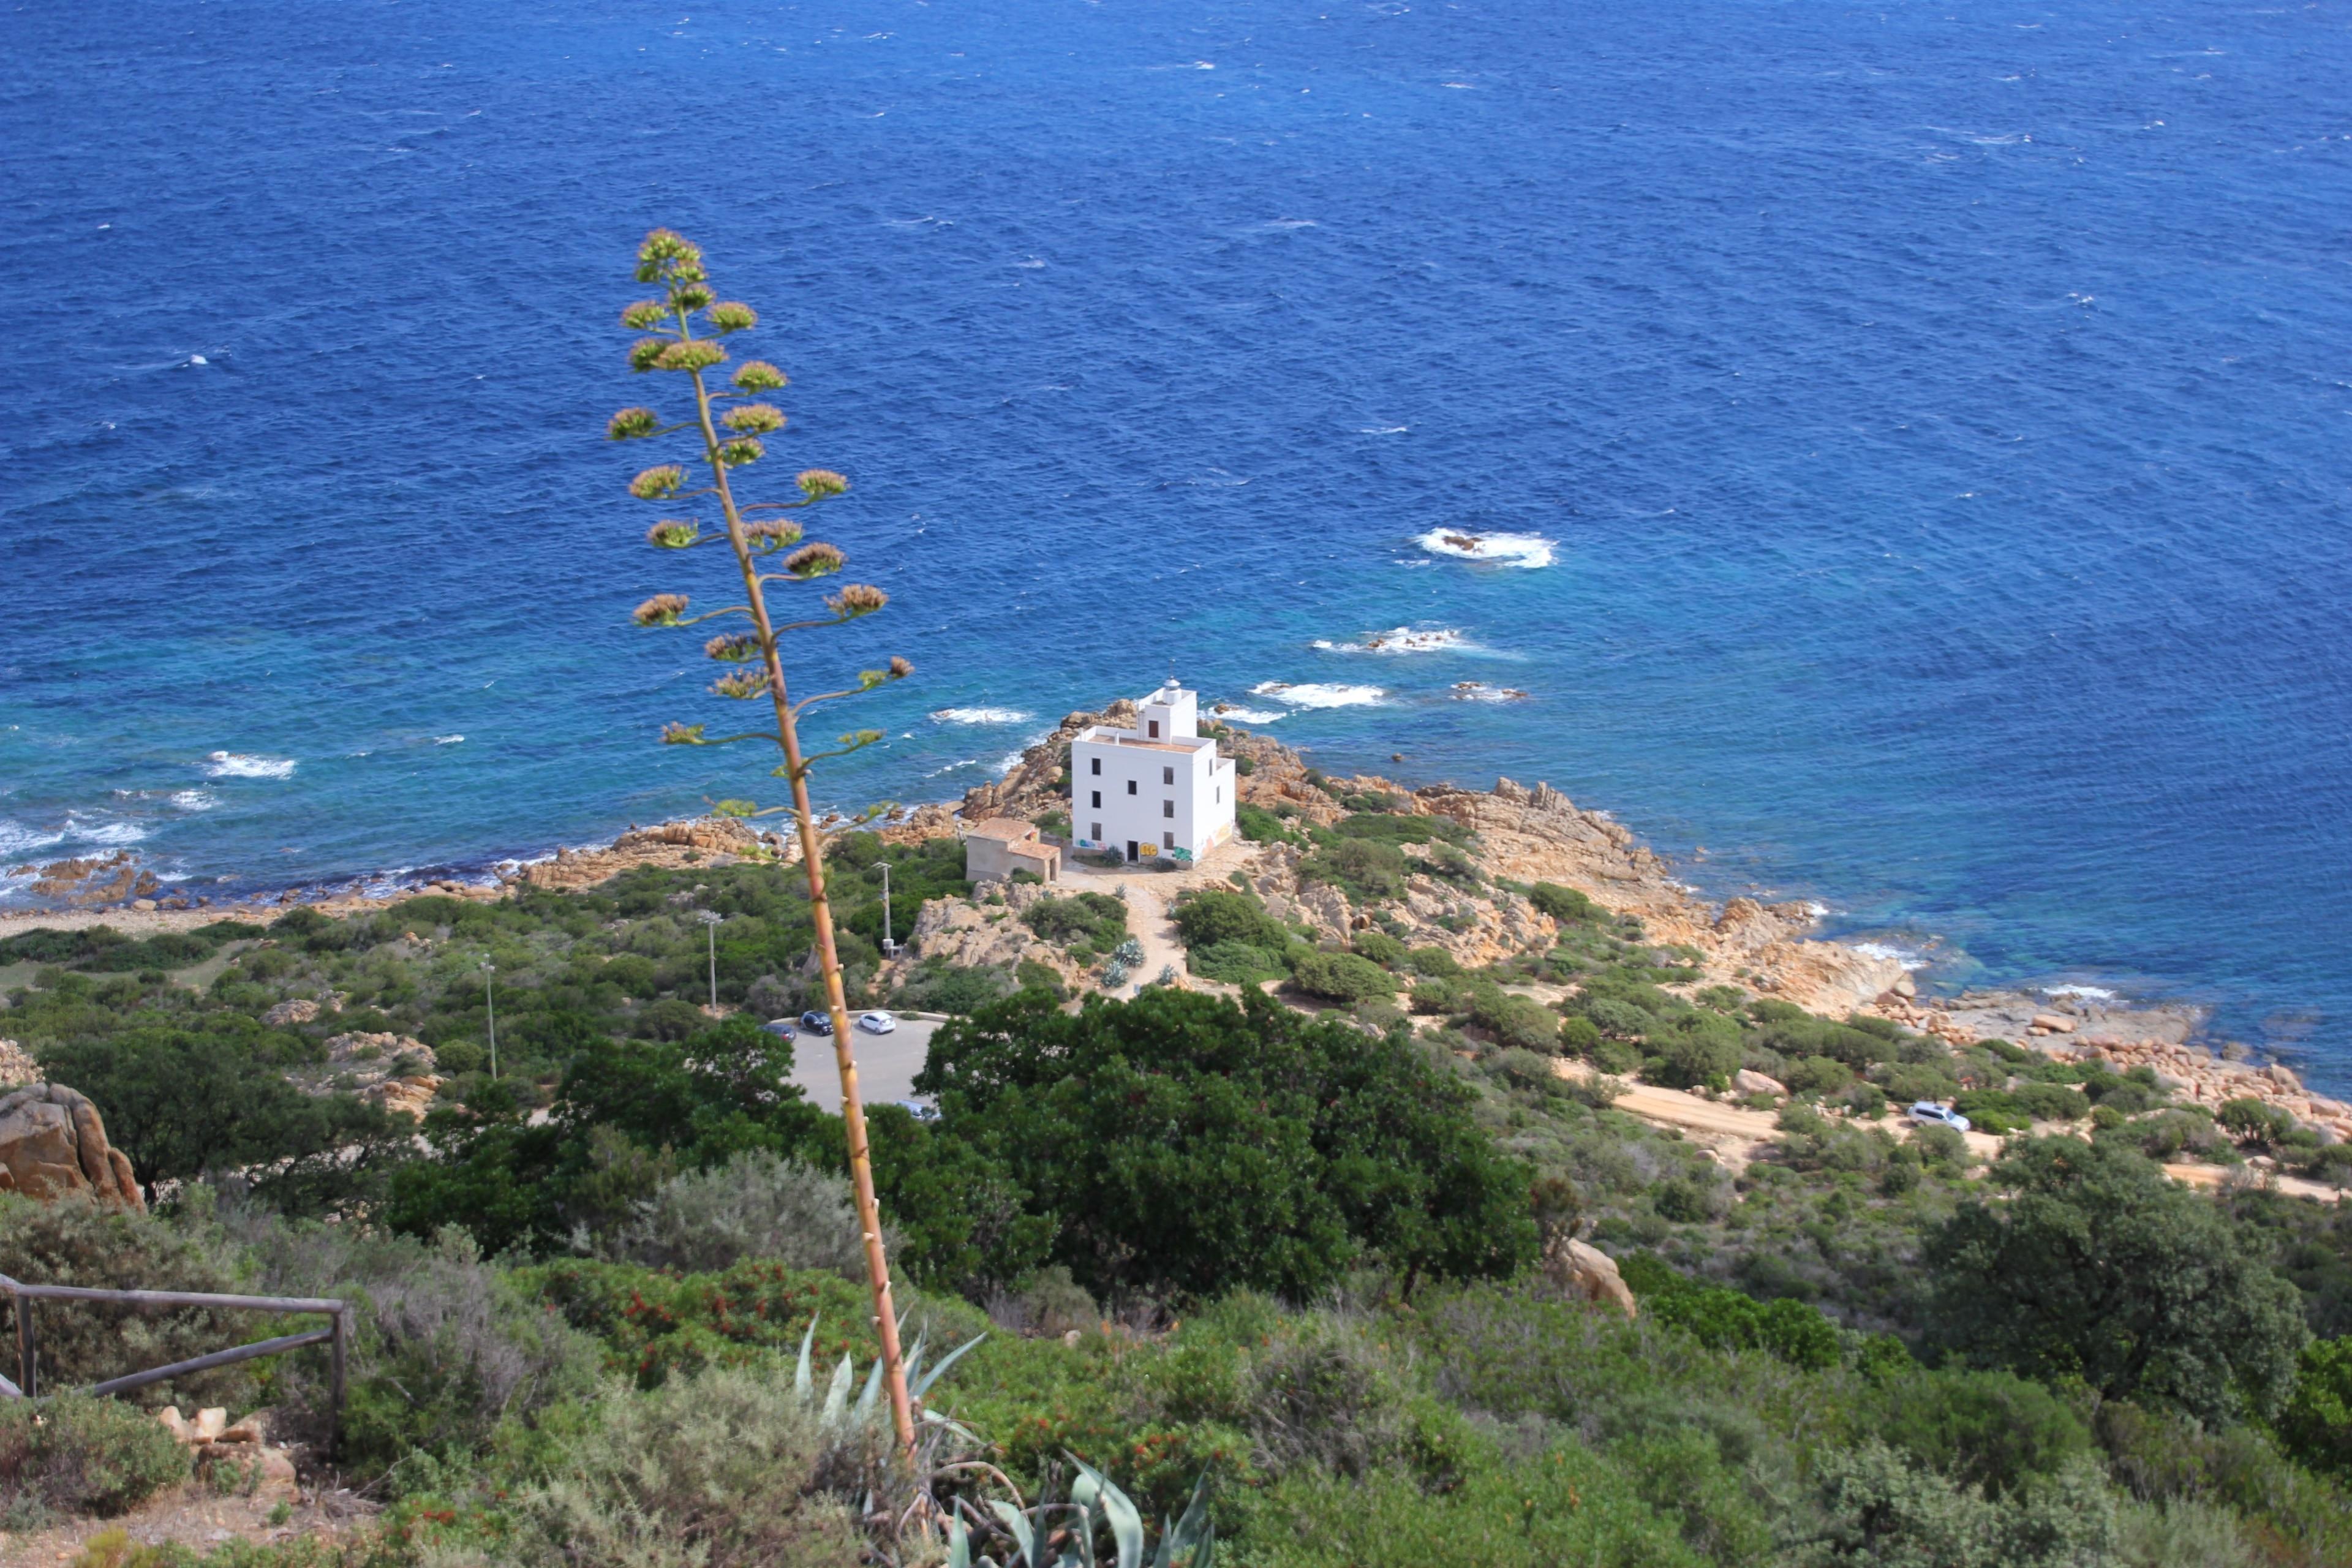 Siniscola, Sardinia, Italy